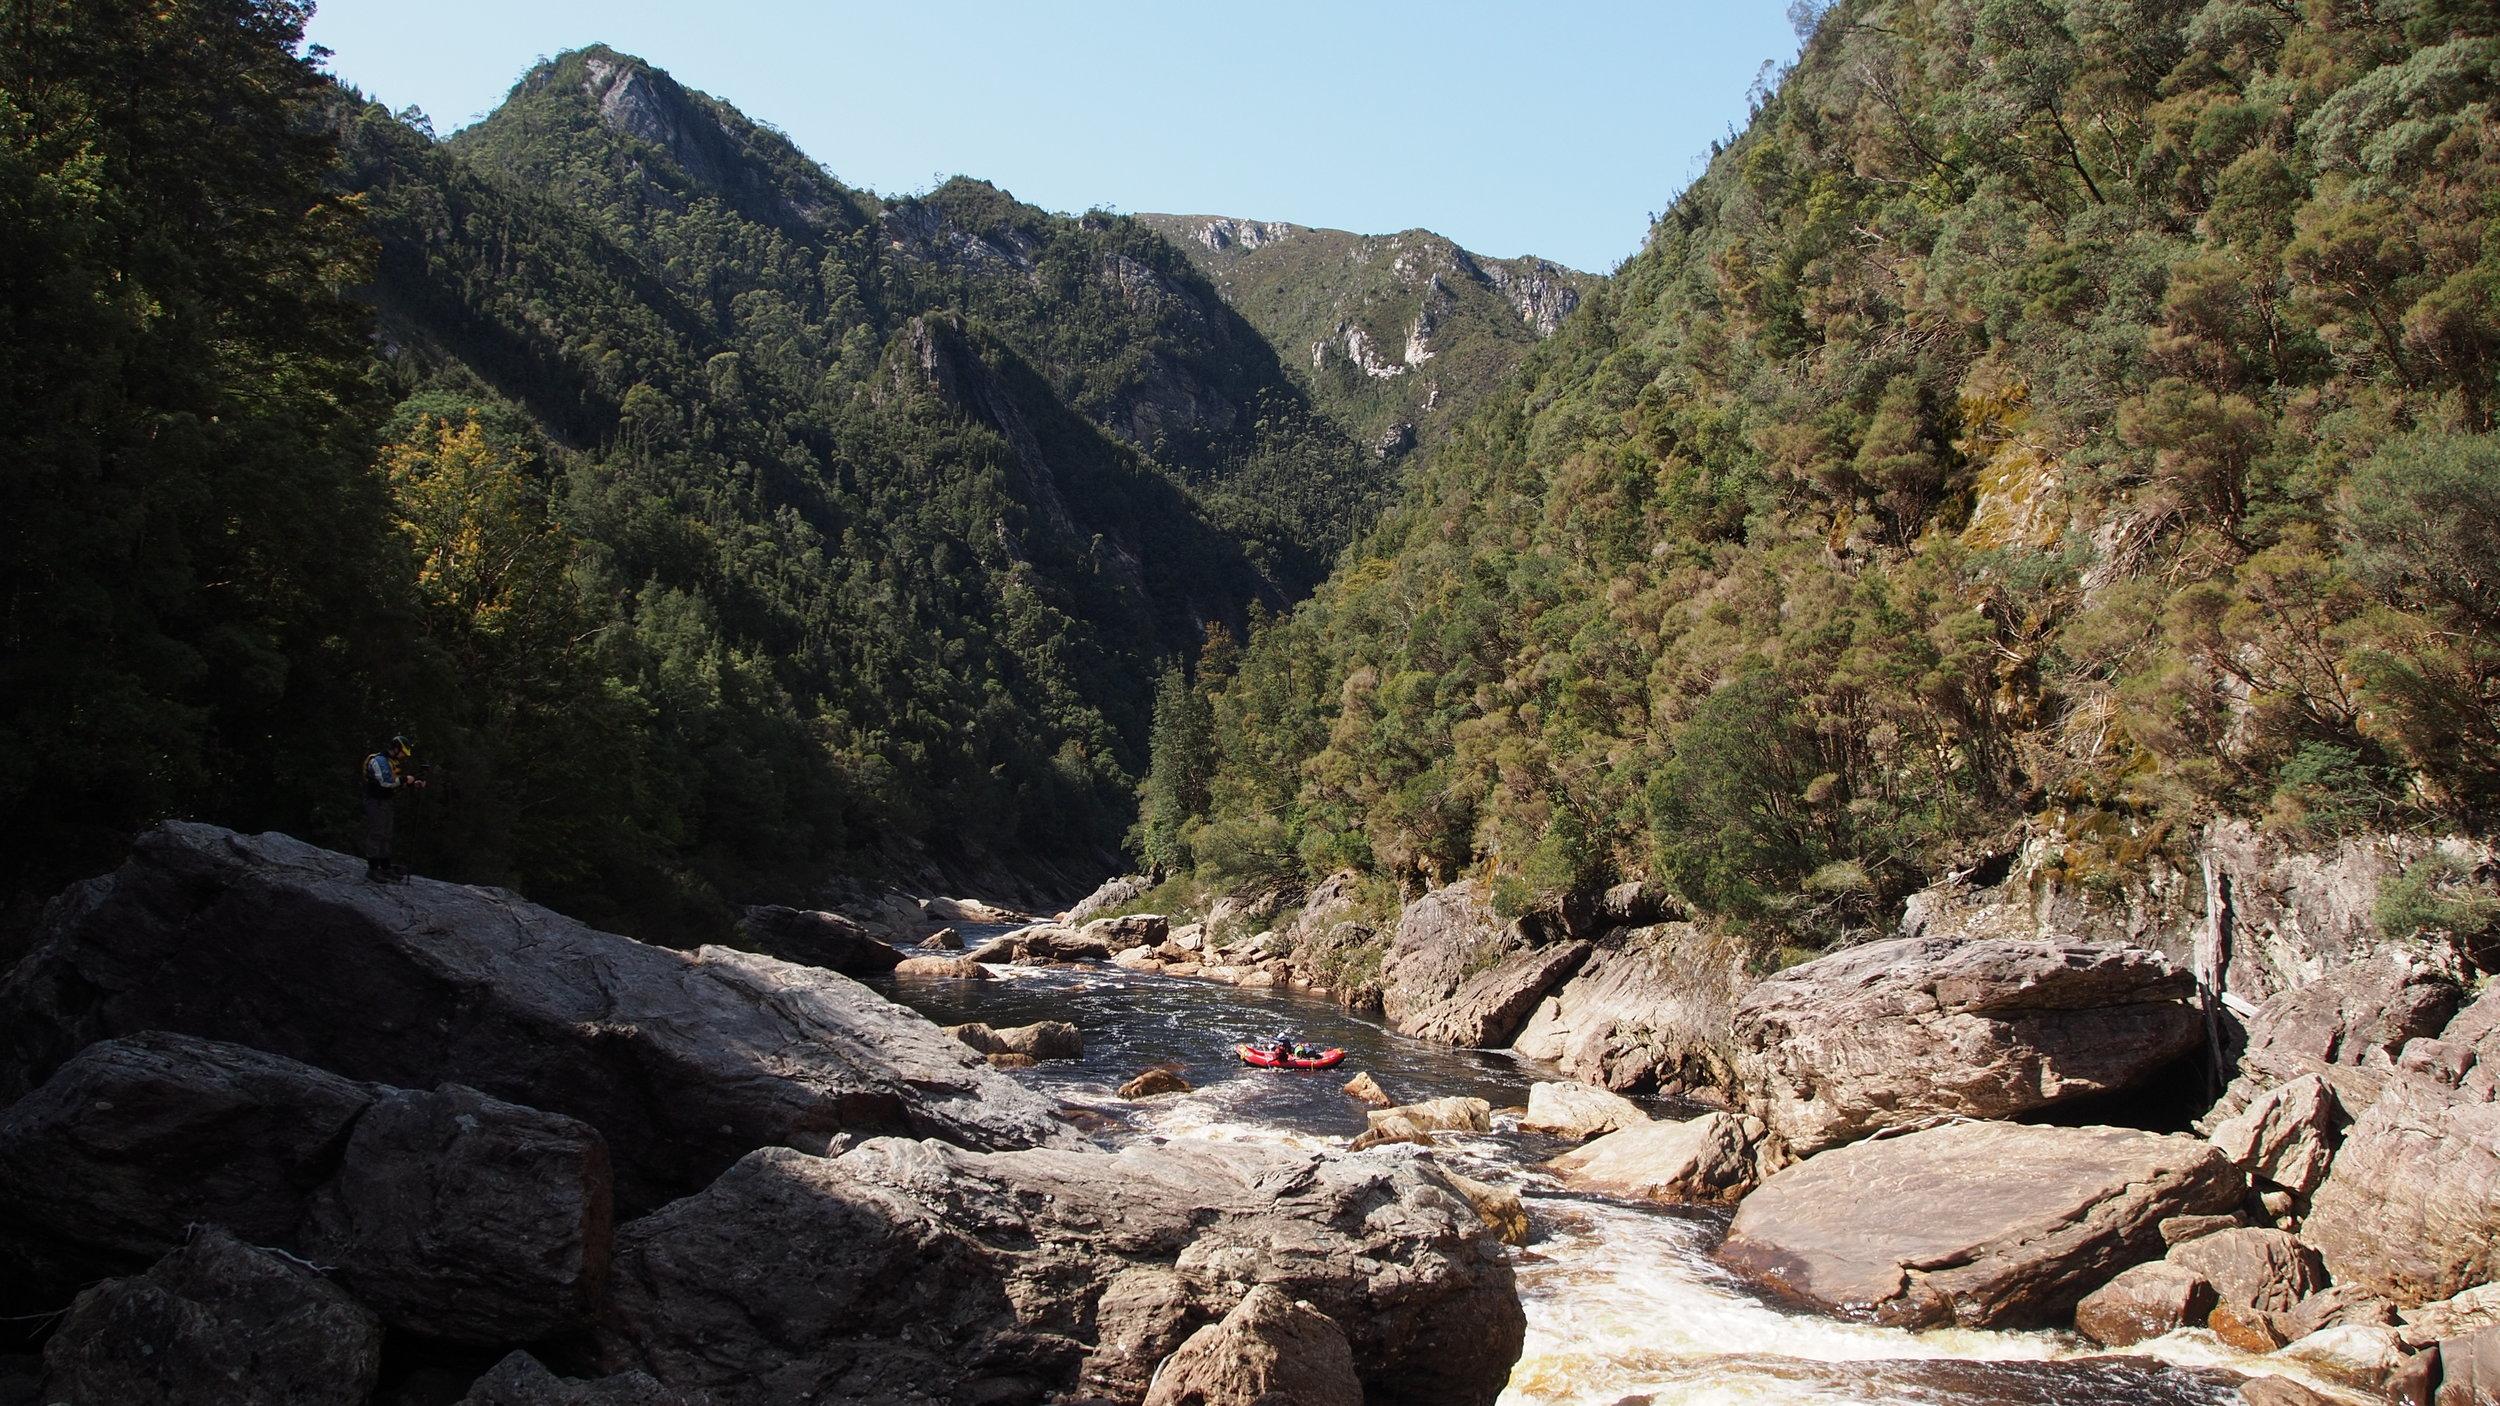 Franklin River Canyon